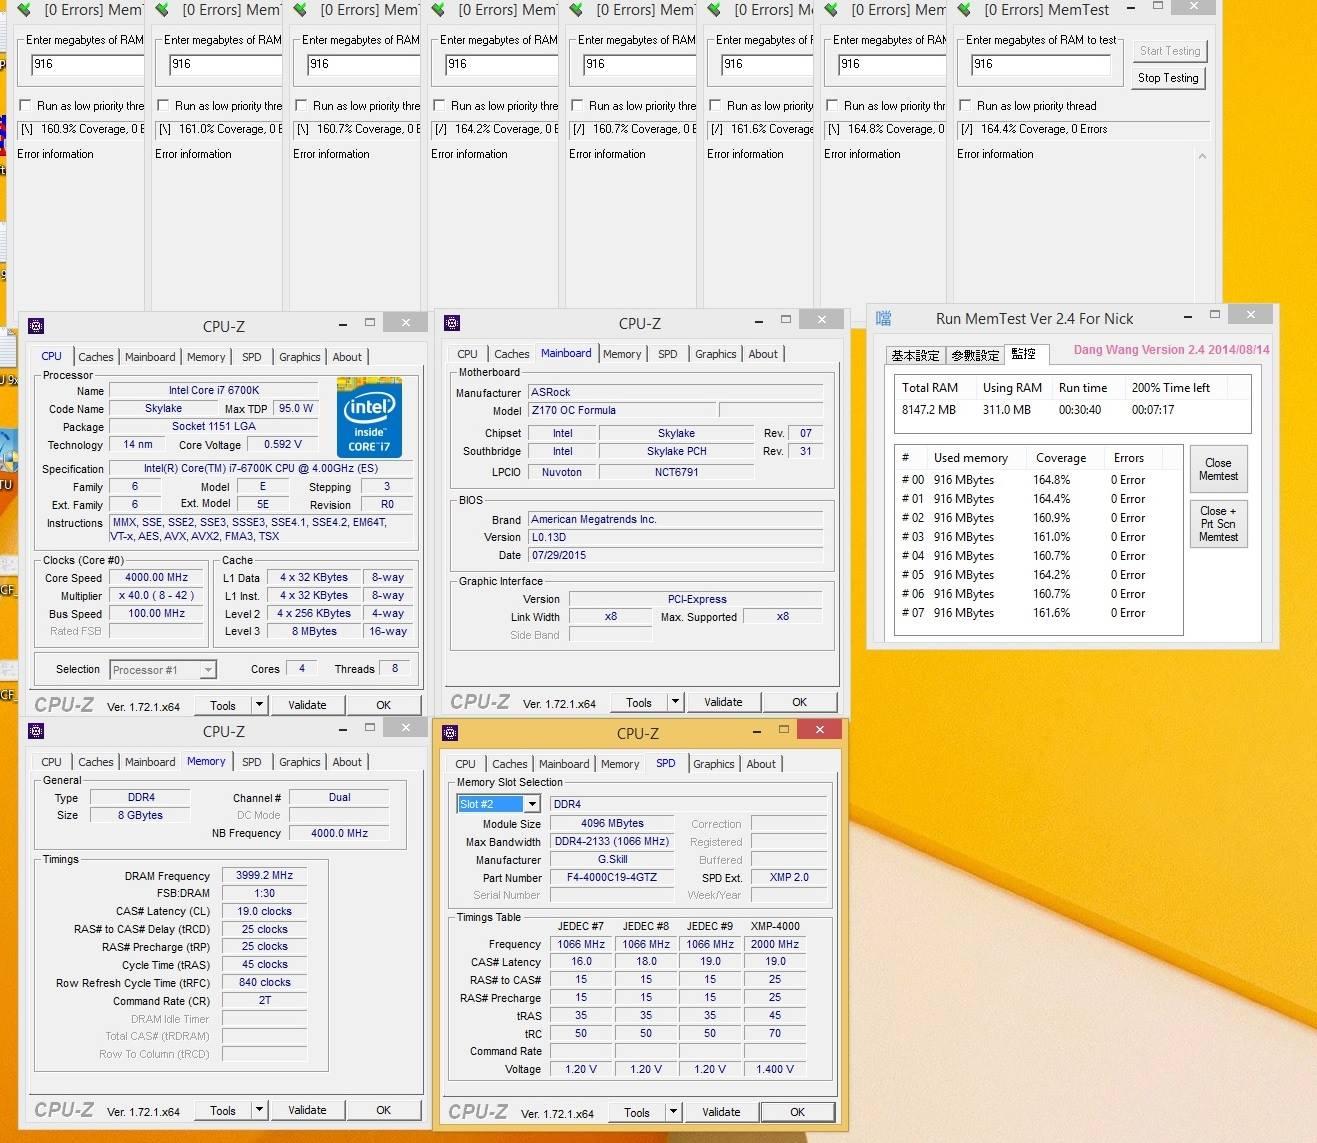 intel-core-i7-6700k_4000-mhz_ddr4-memory_2